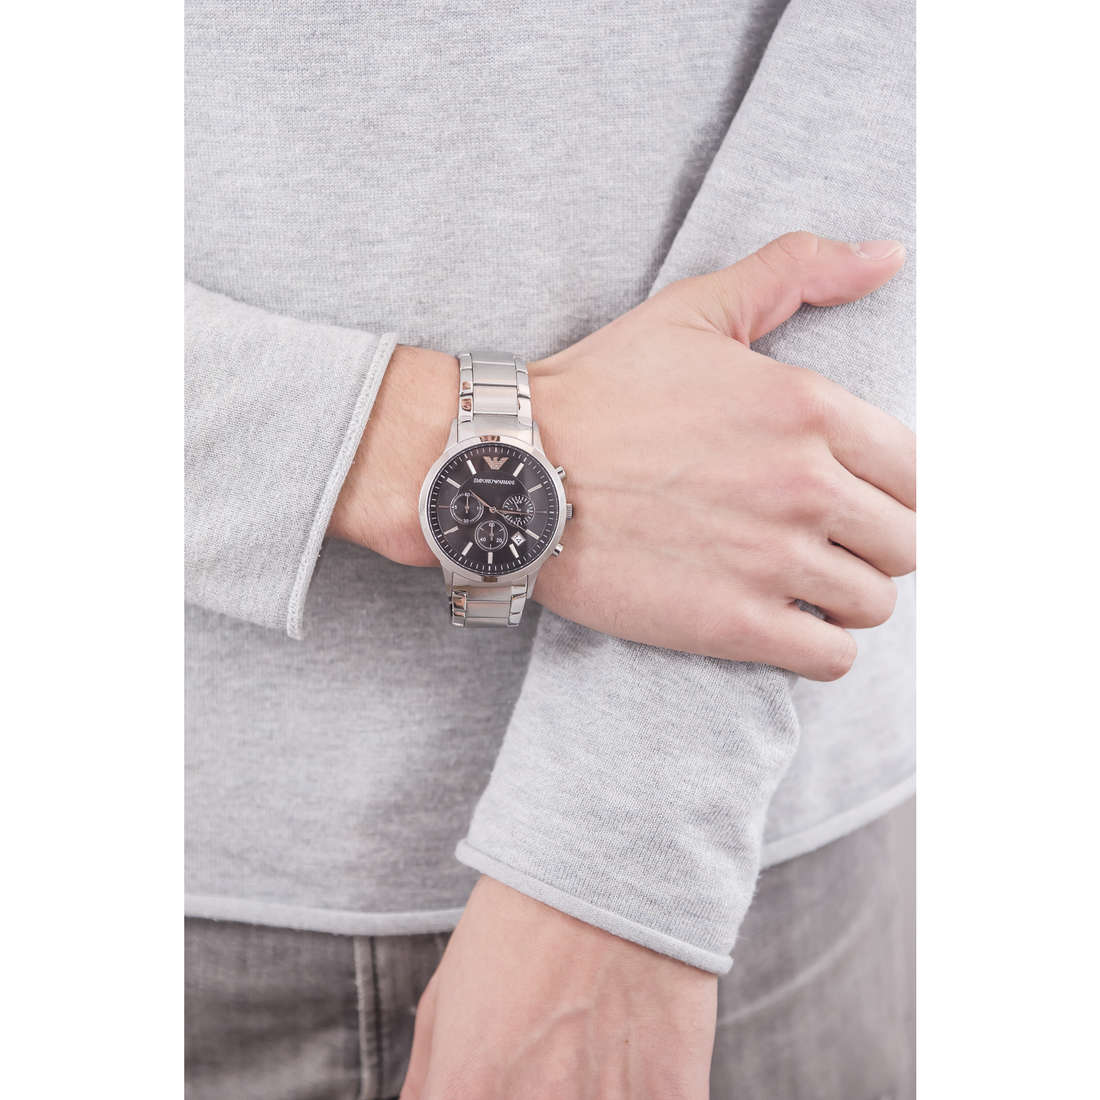 Emporio Armani cronografi uomo AR2434 indosso